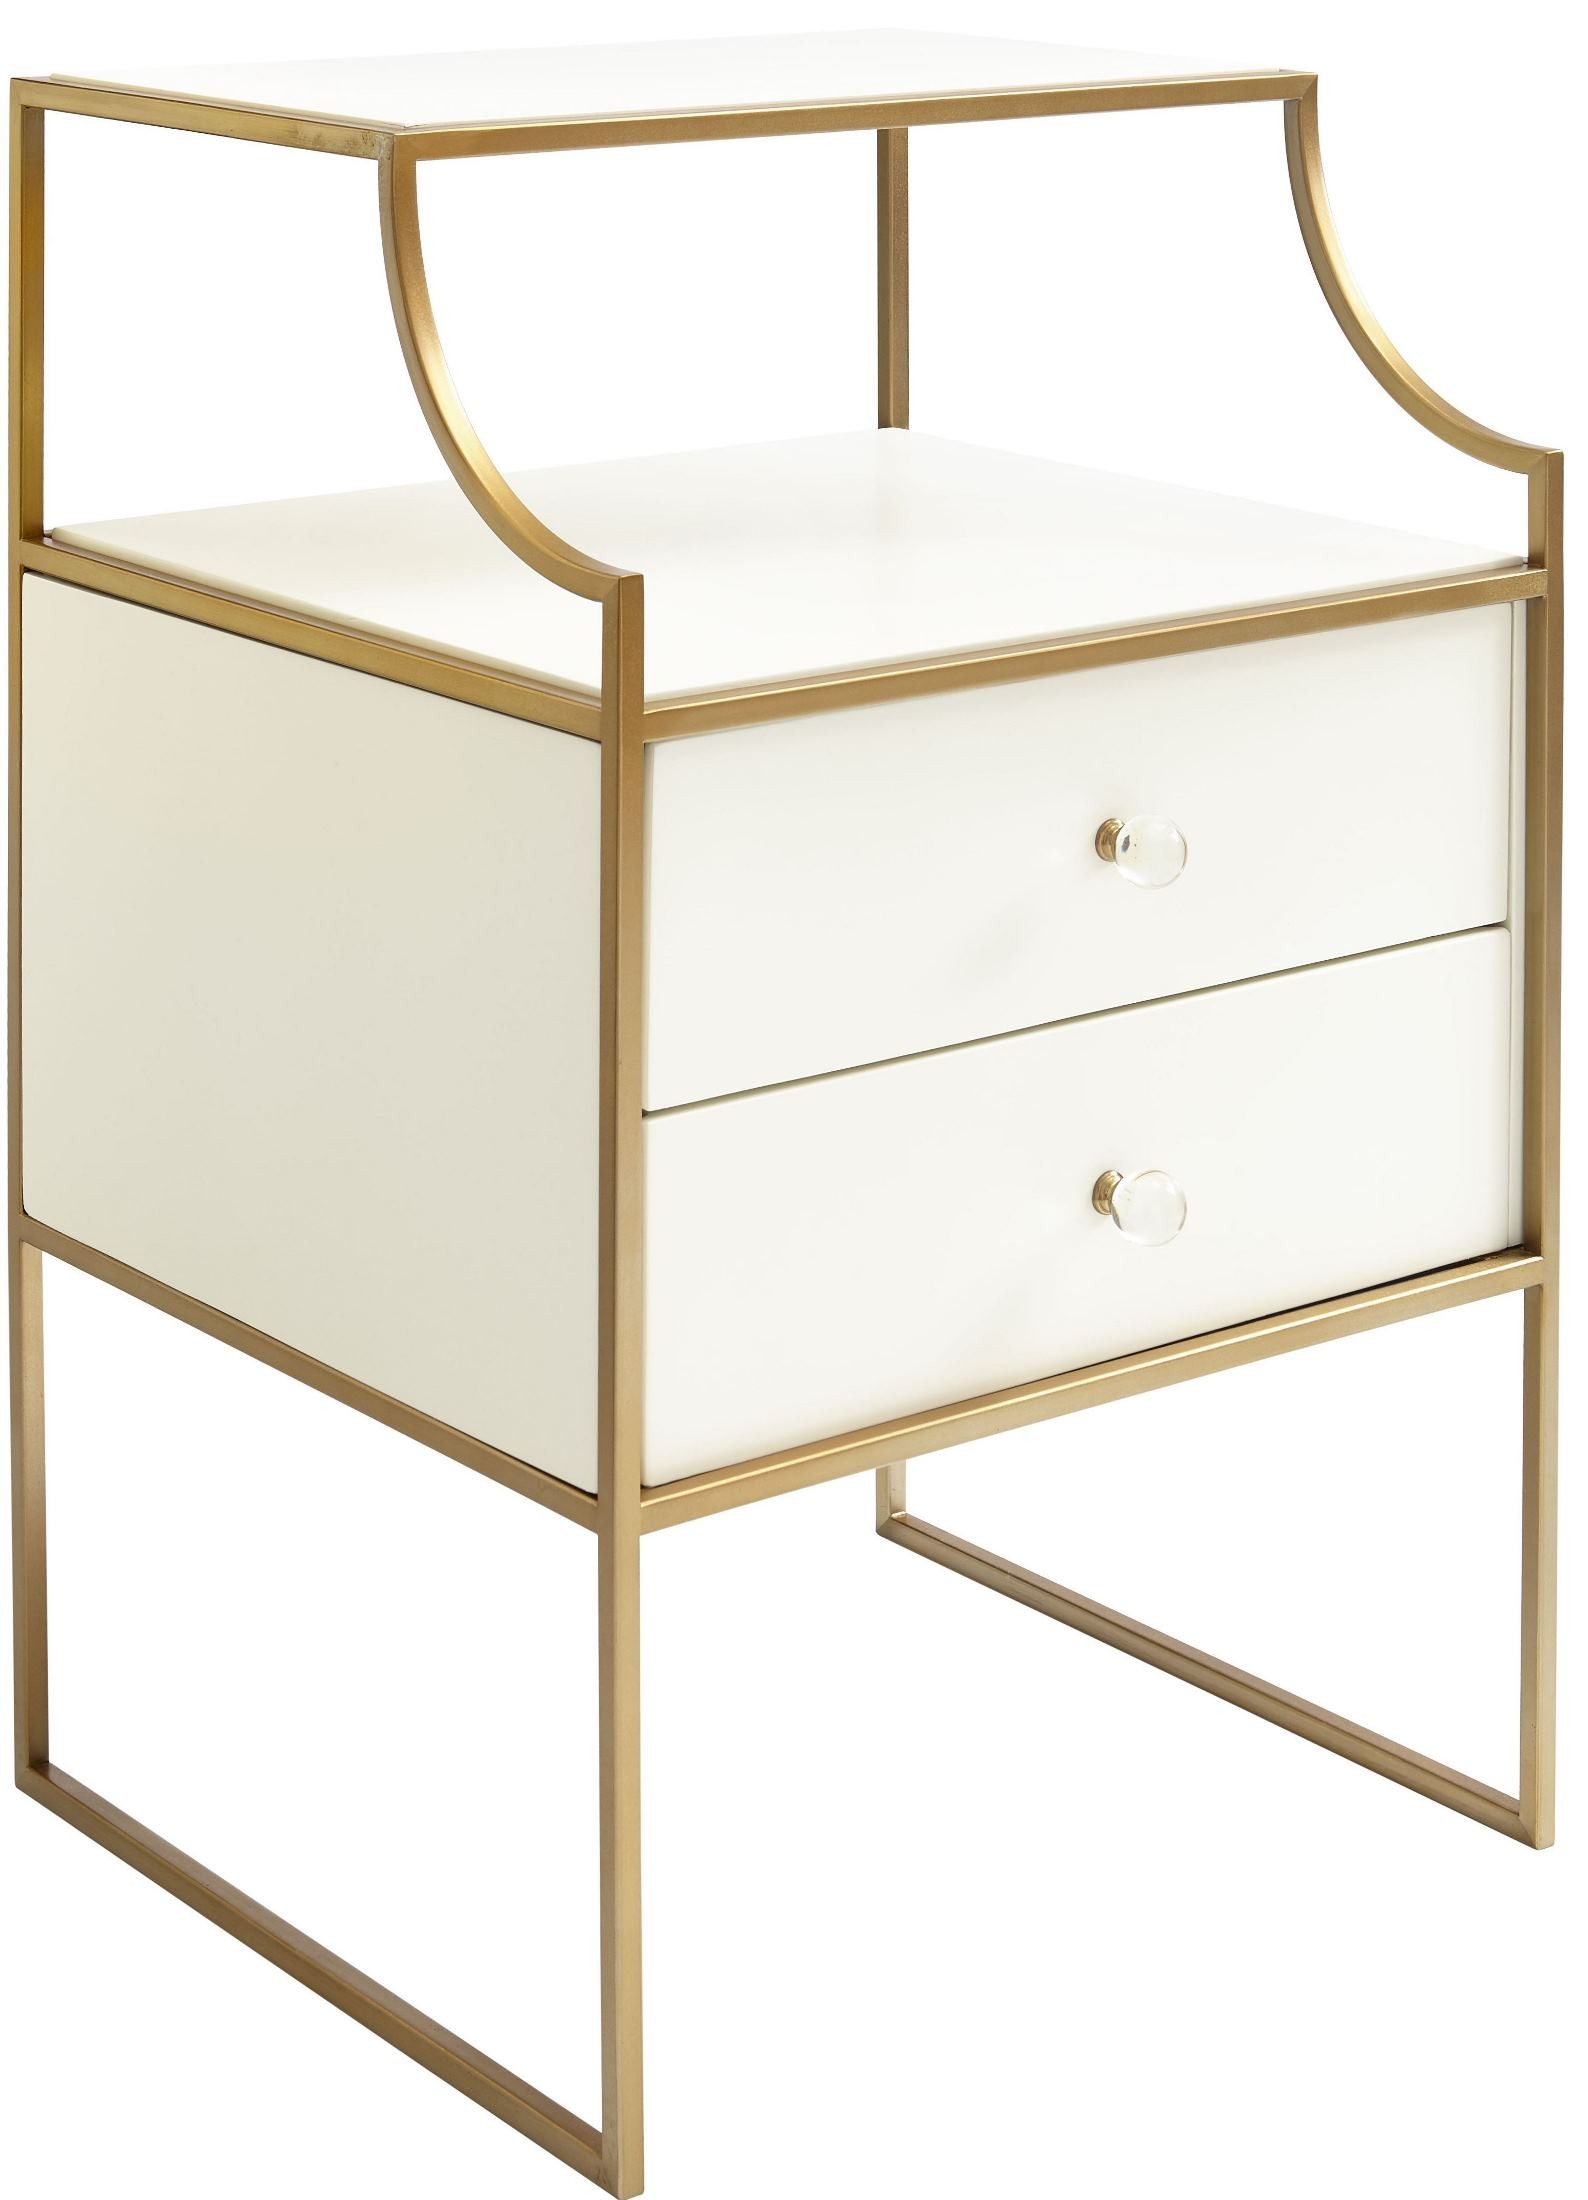 Coastal Living Oasis Saltbox White Catalina Panel Bedroom Set 527 23 40 Stanley Furniture